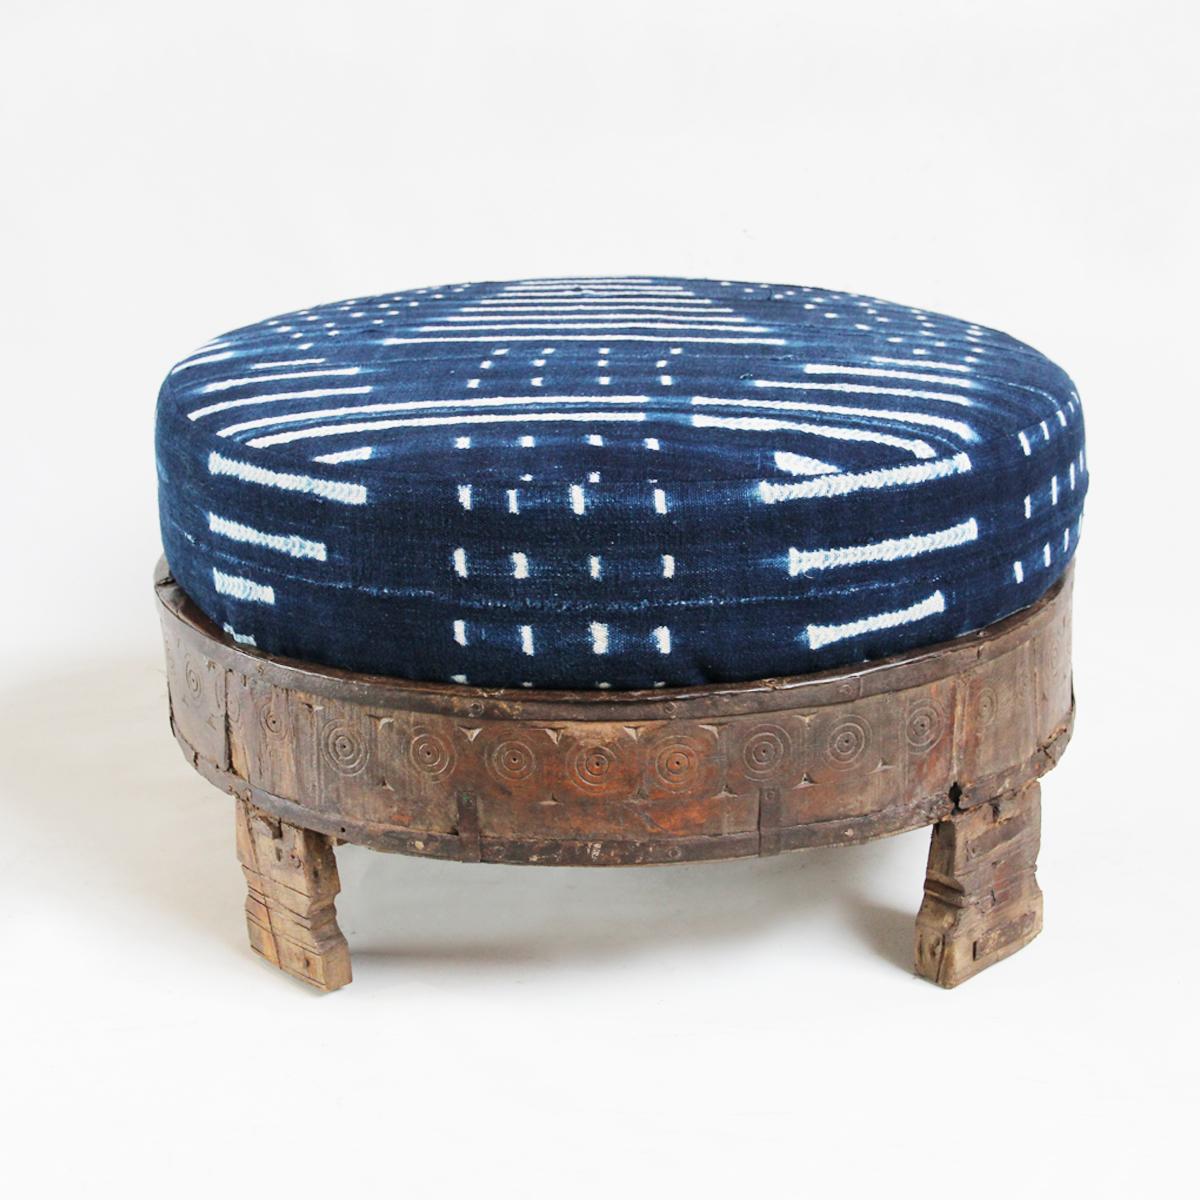 Grinder Stool Mudcloth Ottoman Furniture Design Mix Gallery